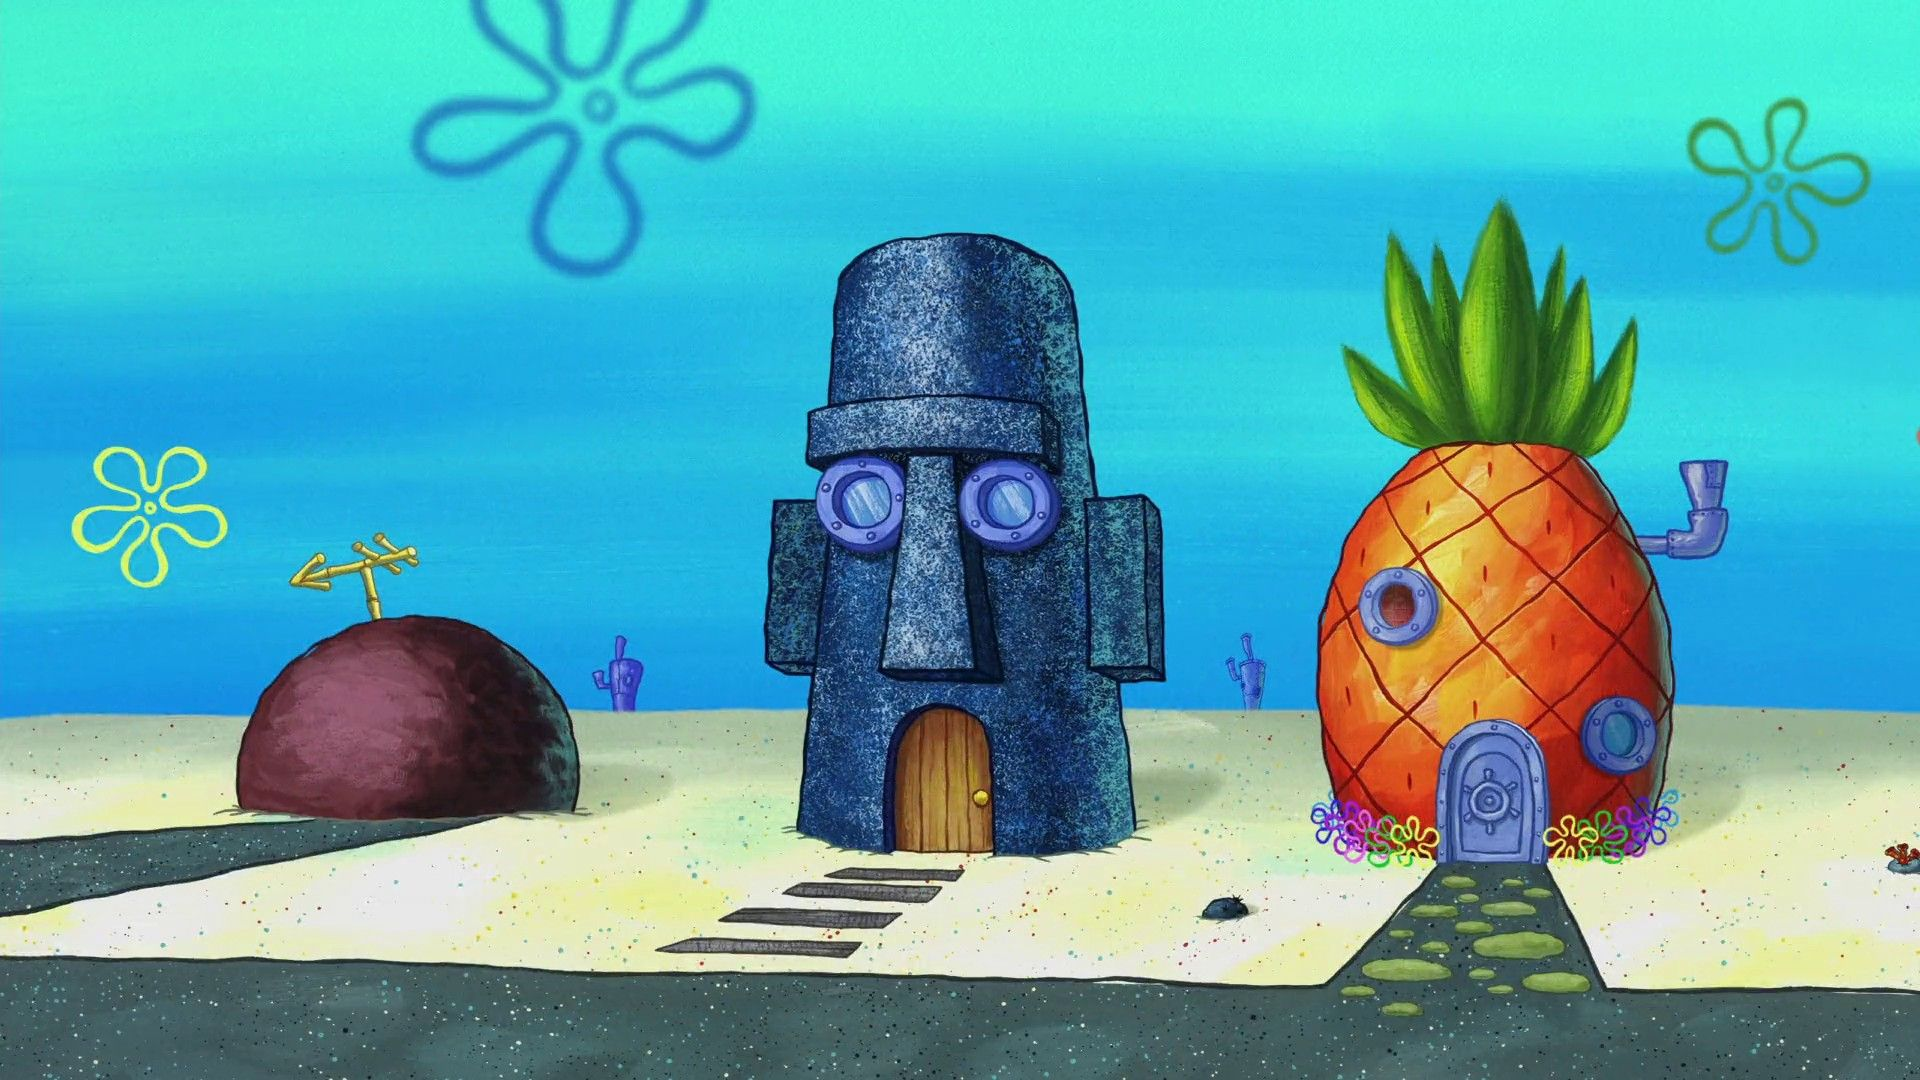 Spongebob House Spongebob Drawings Spongebob Background